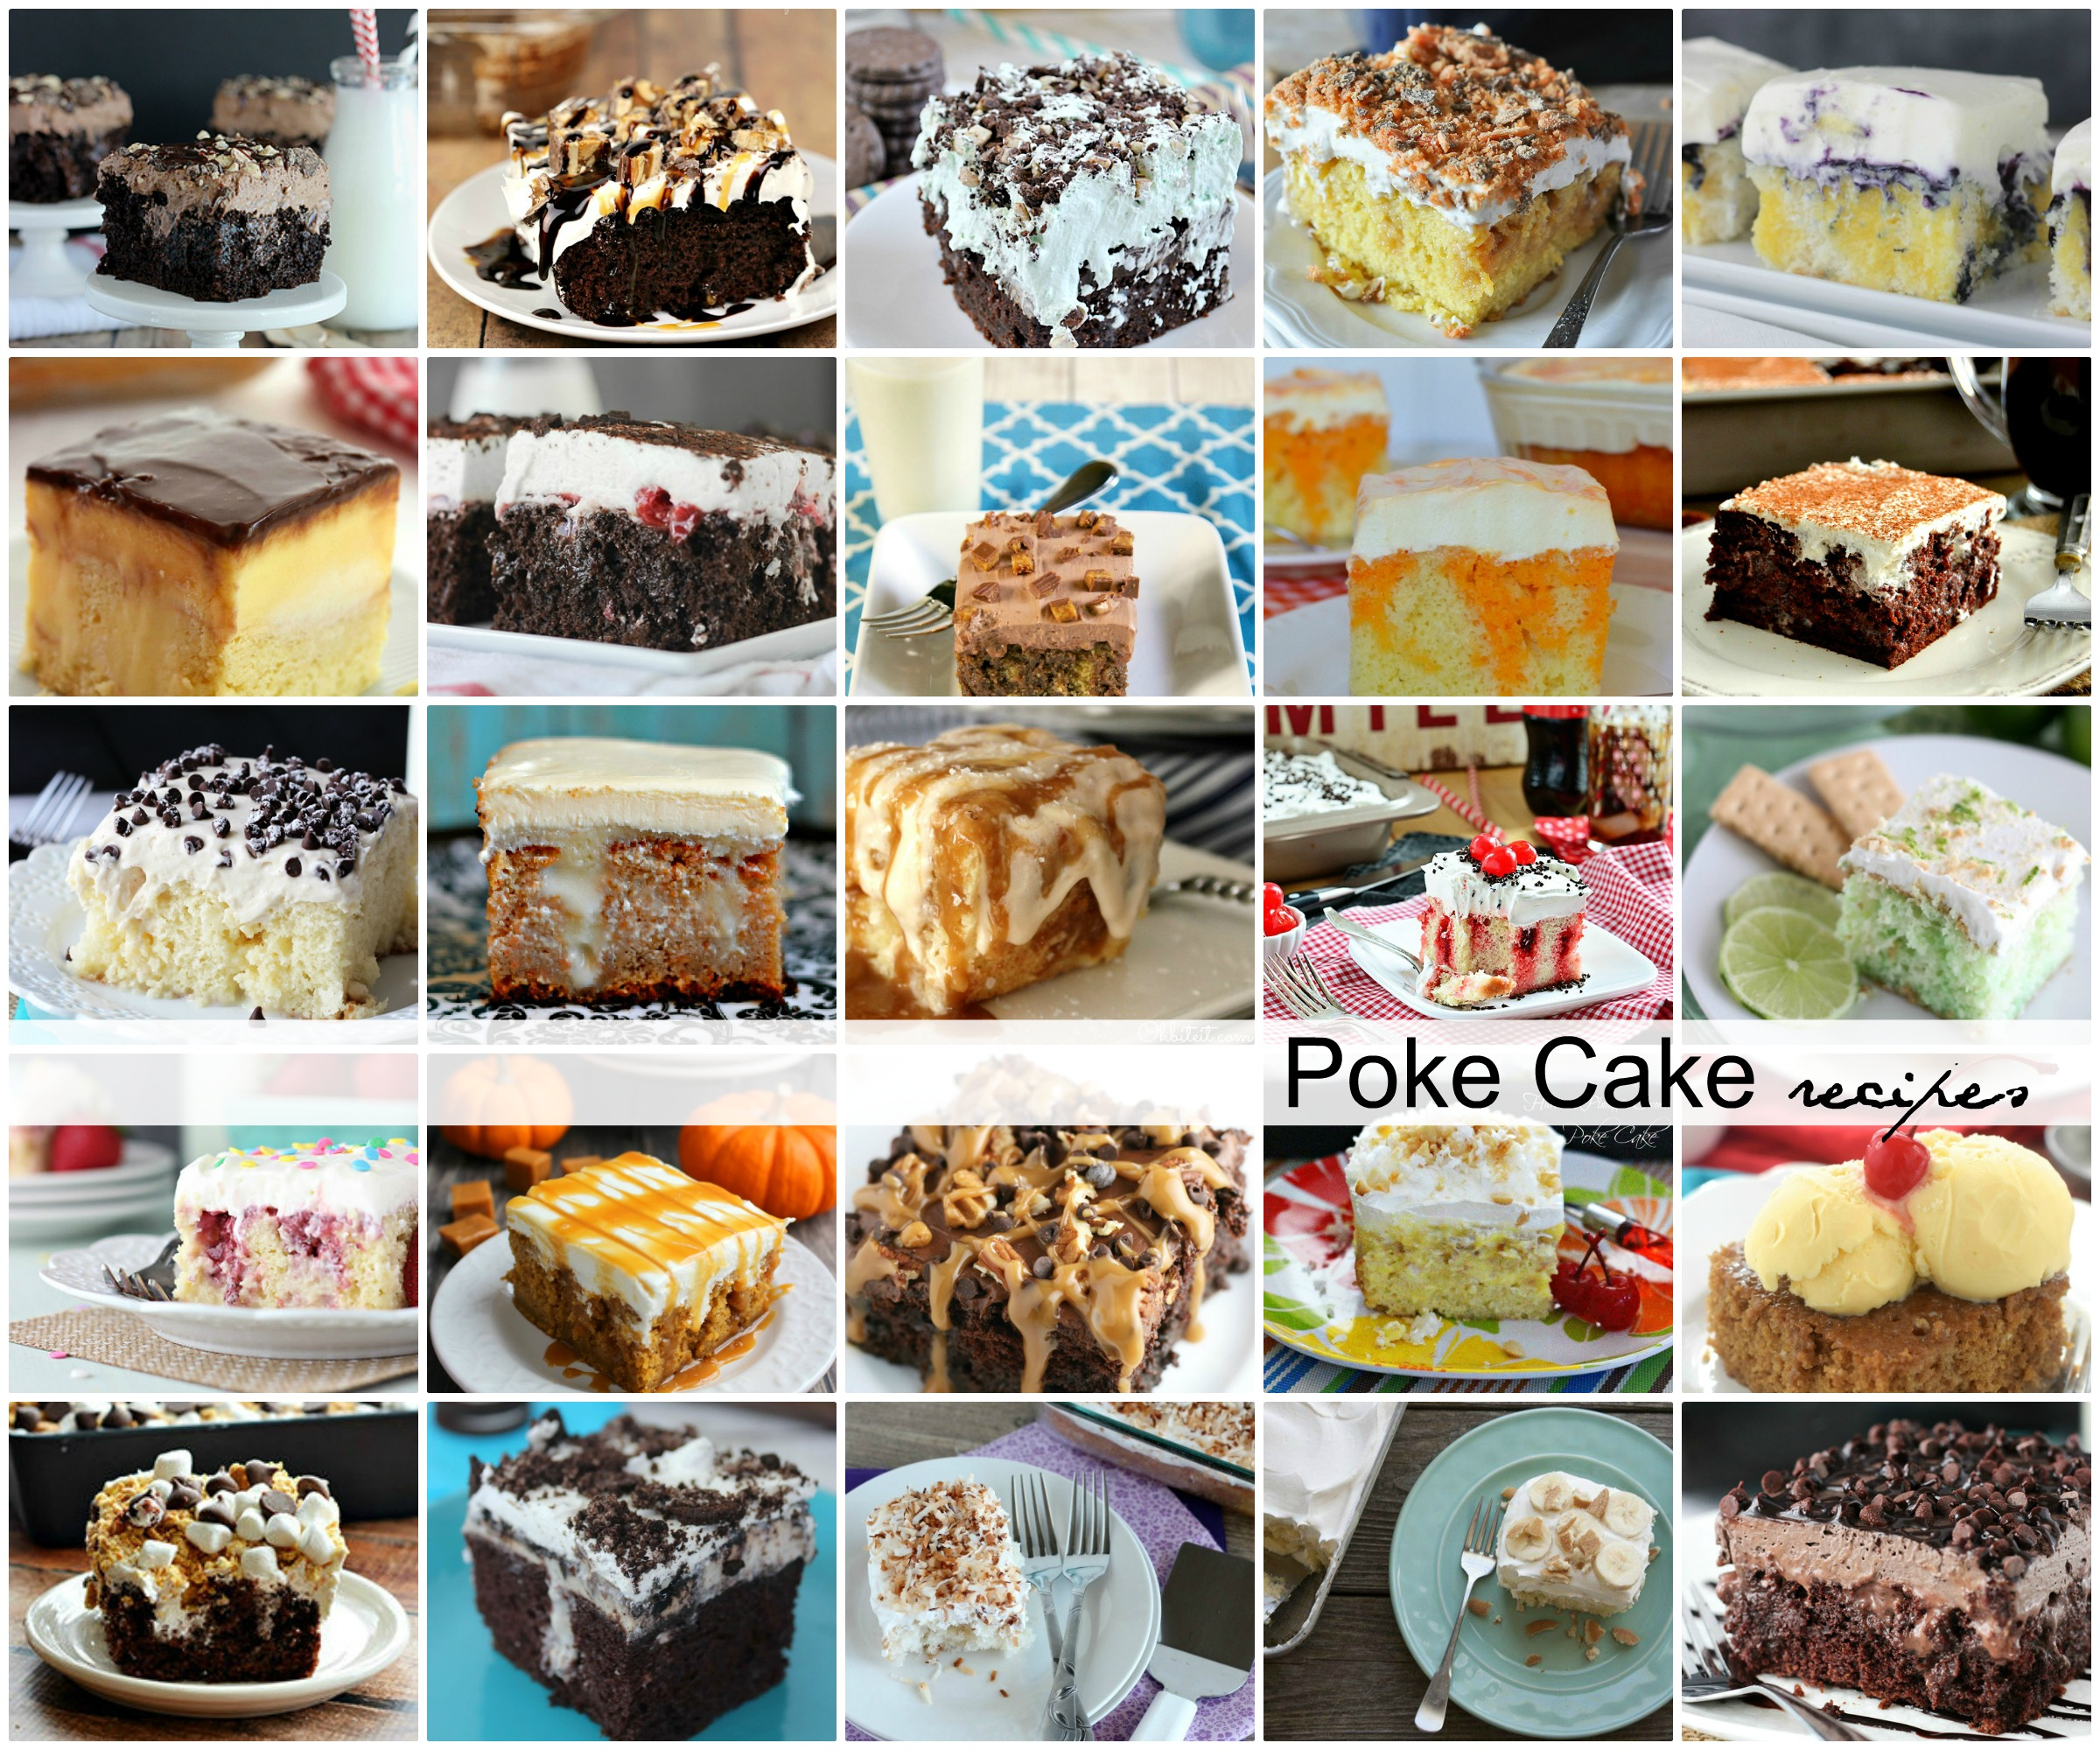 Poke-Cake-Recipes-Dessert-1